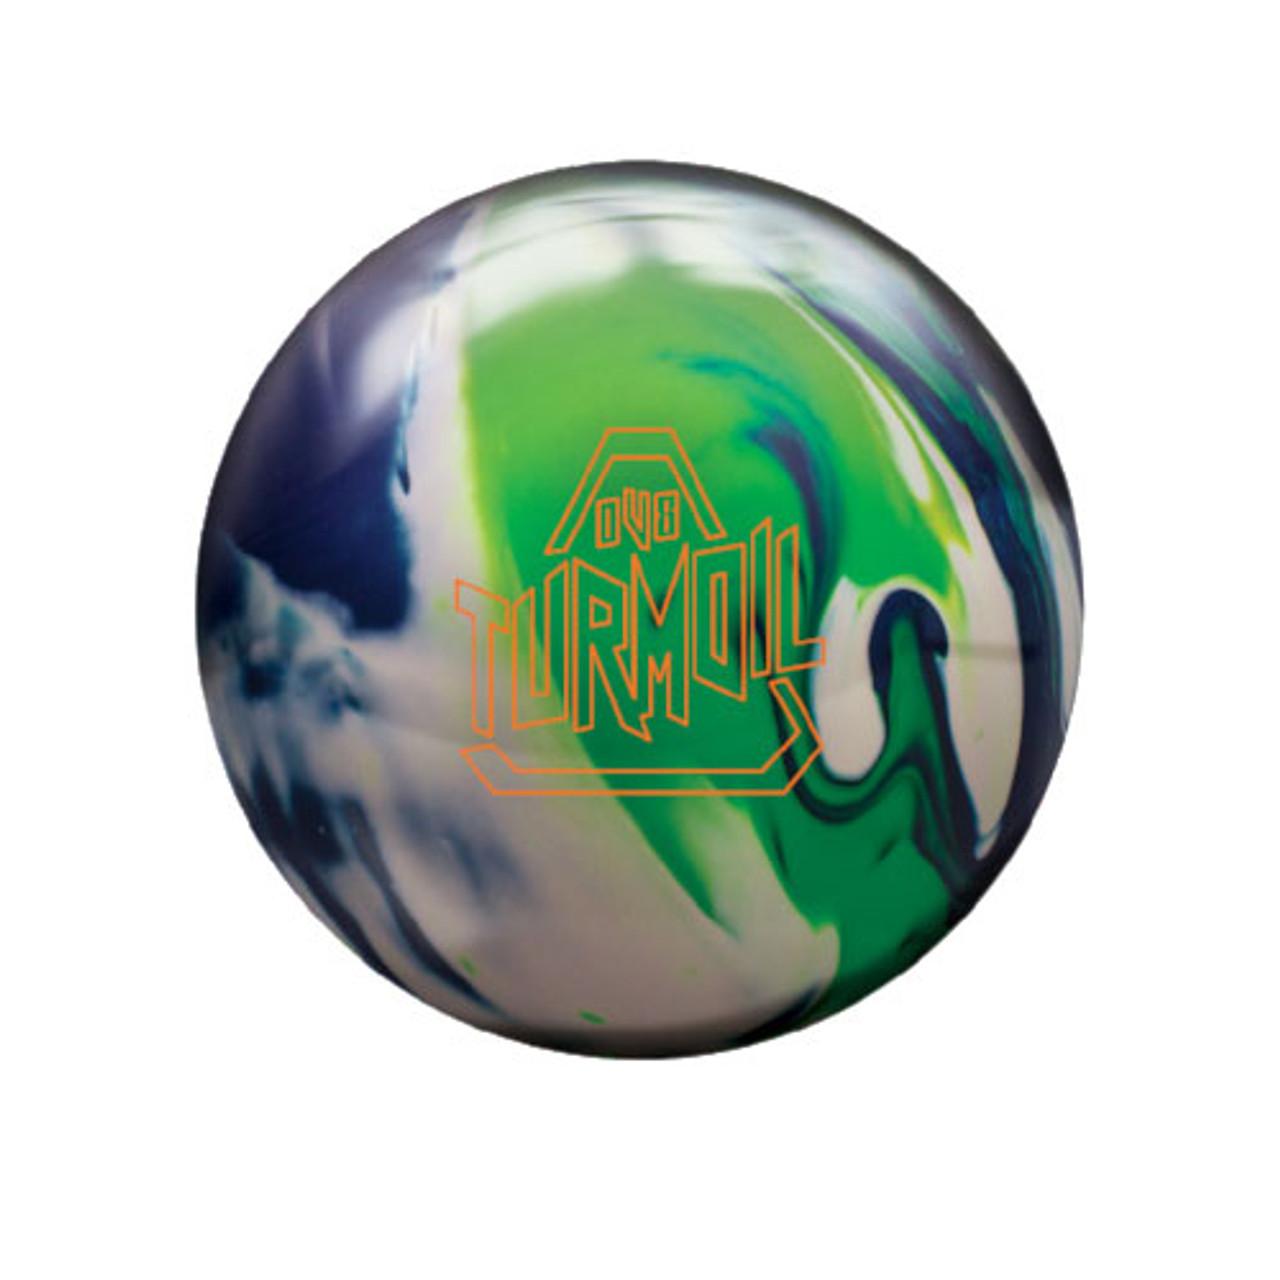 DV8 Turmoil Hybrid Bowling Ball